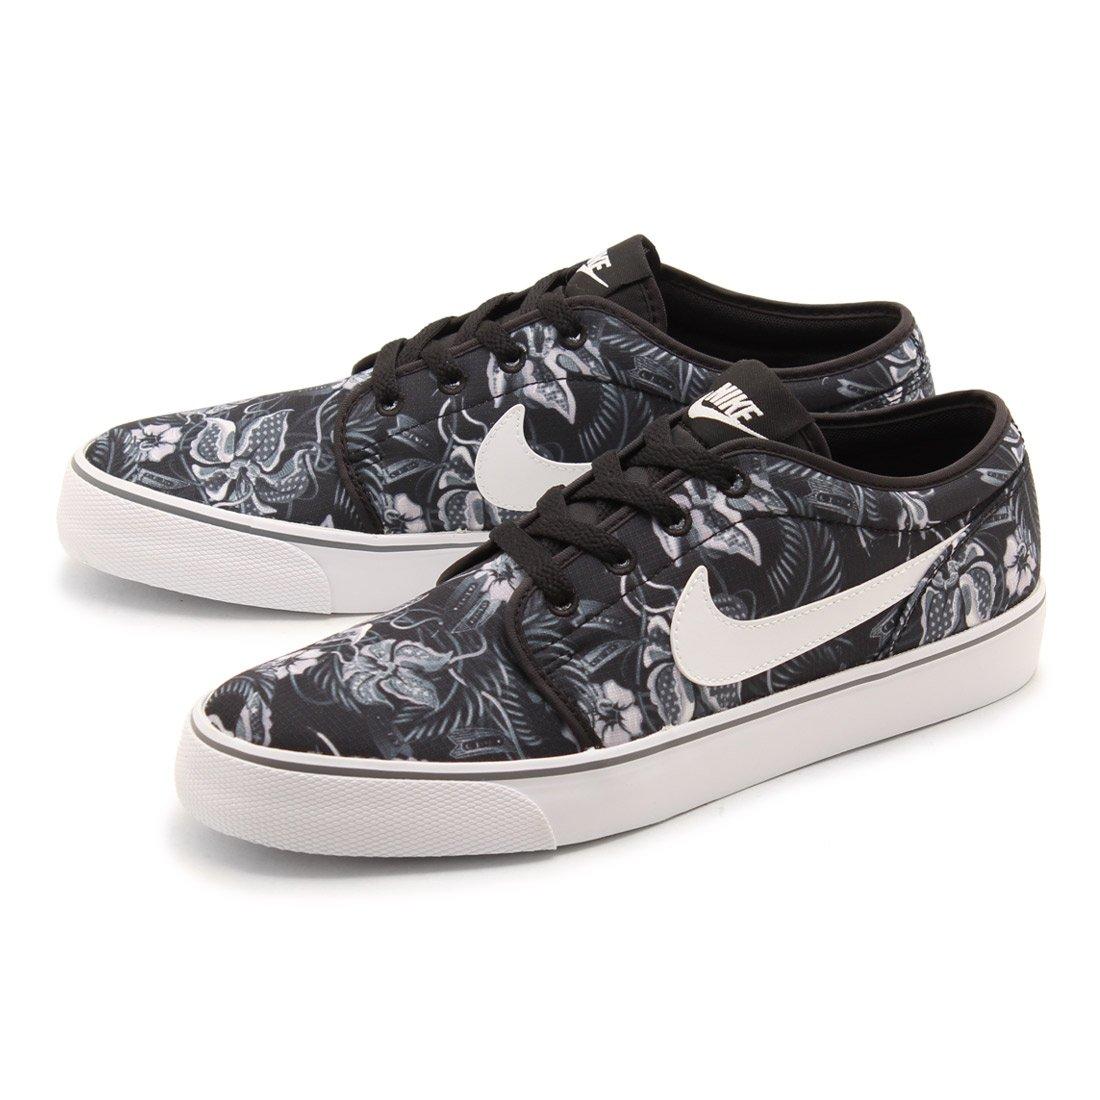 Nike Kids' Grade School Toki Low Textile Casual Shoes